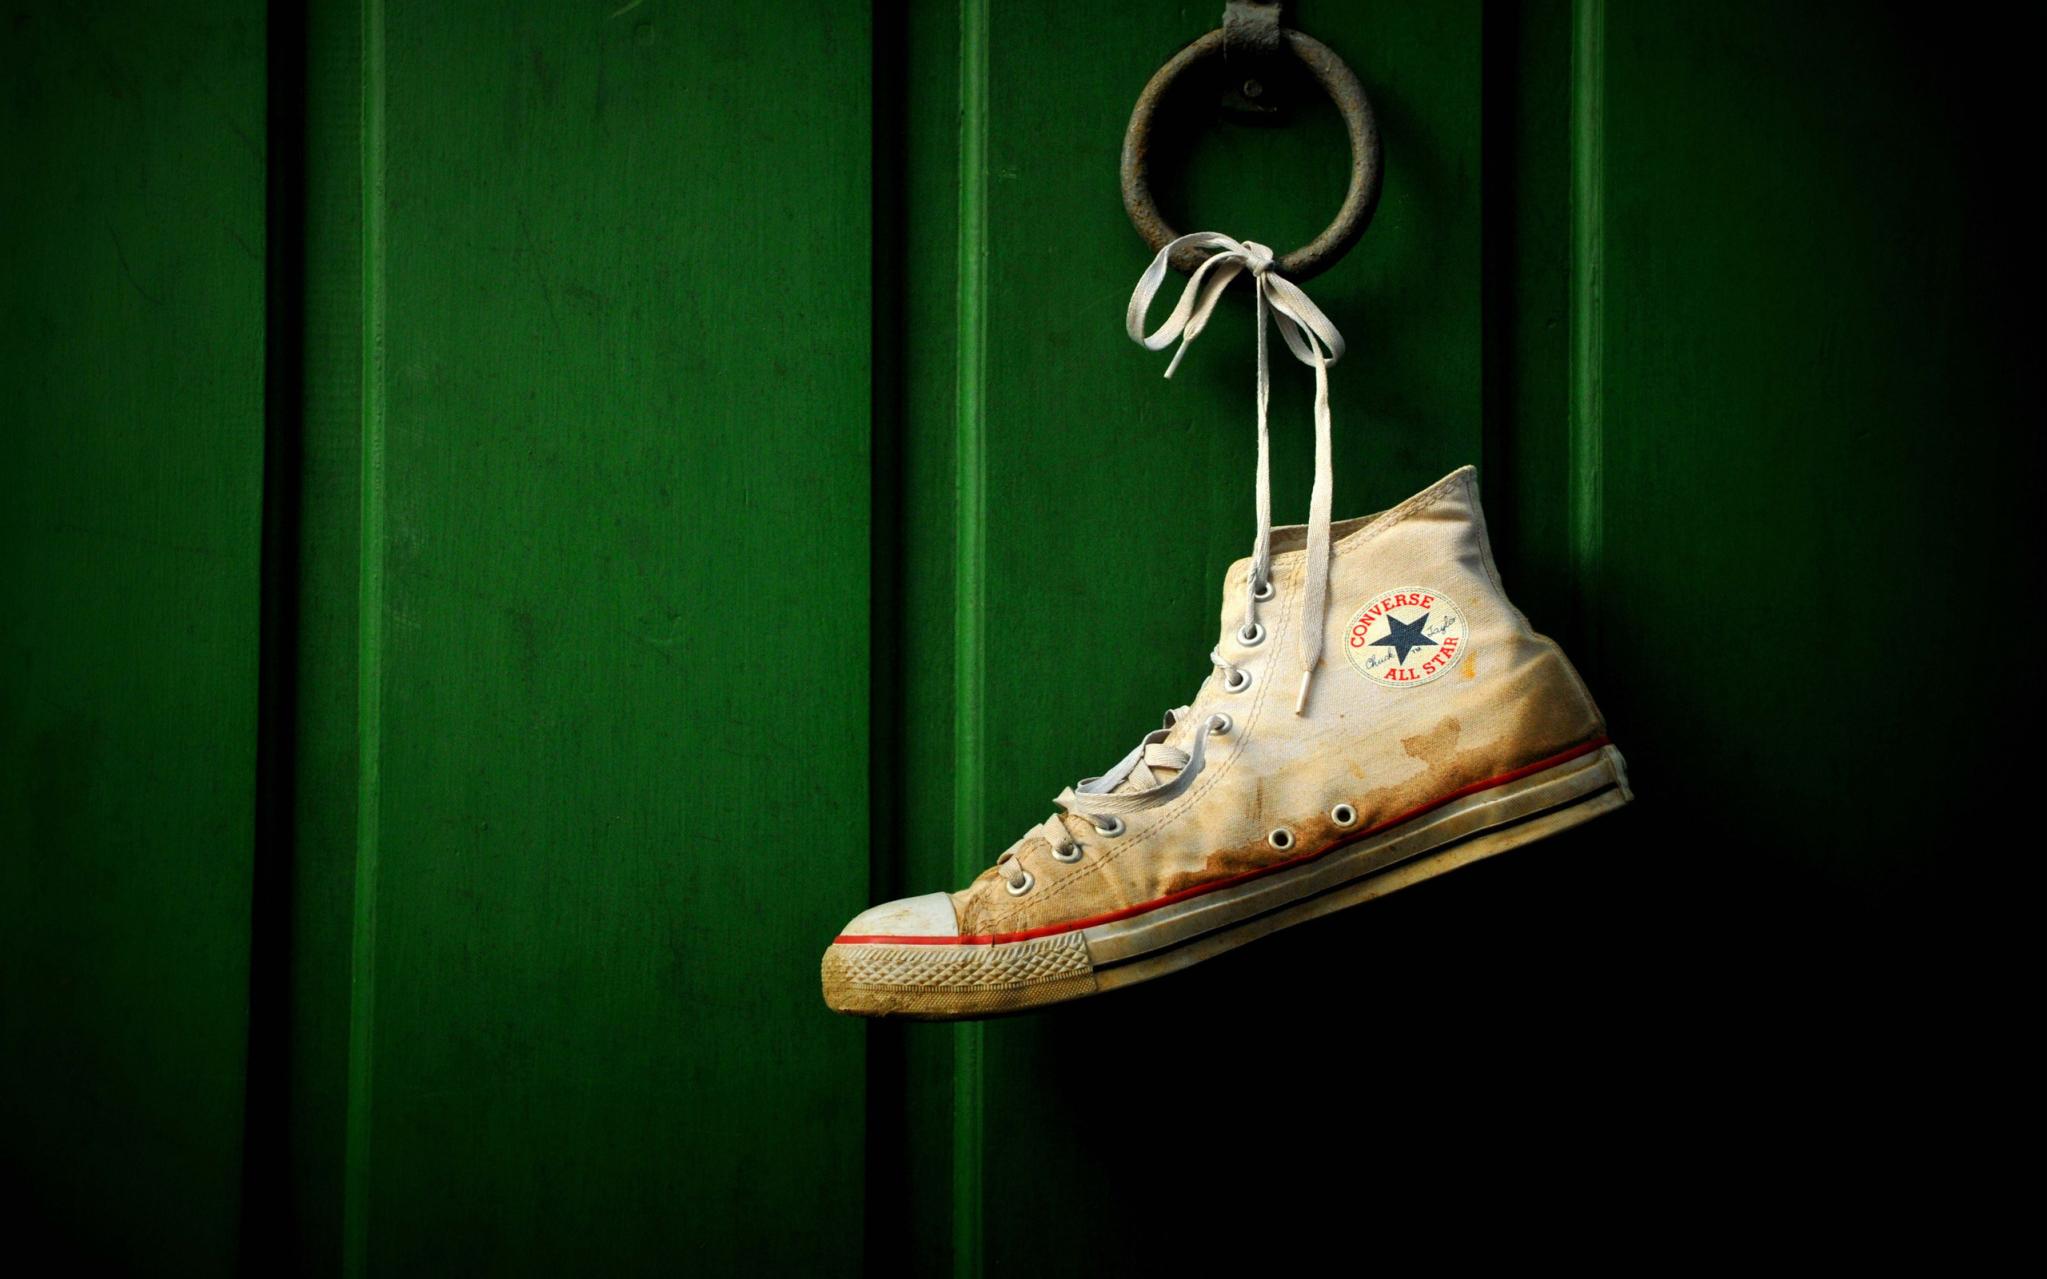 Download Dirty Converse Shoe Wallpaper Wallpapers 2047x1279